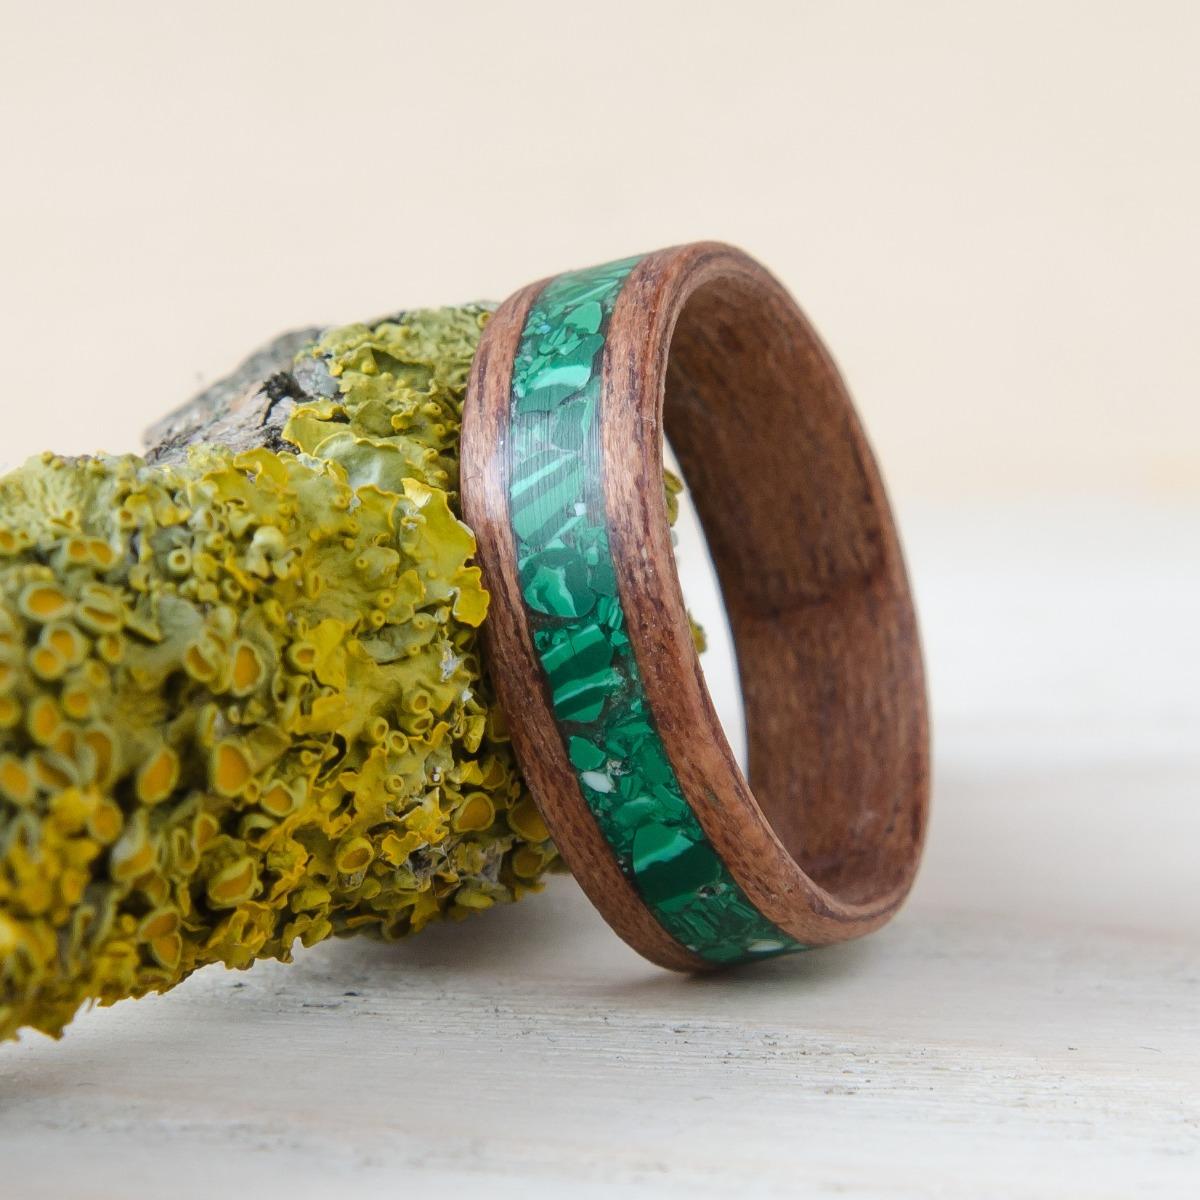 Nordwood Rings Dřevěný prstýnek MAHOGANY & MALACHITE NWR270652